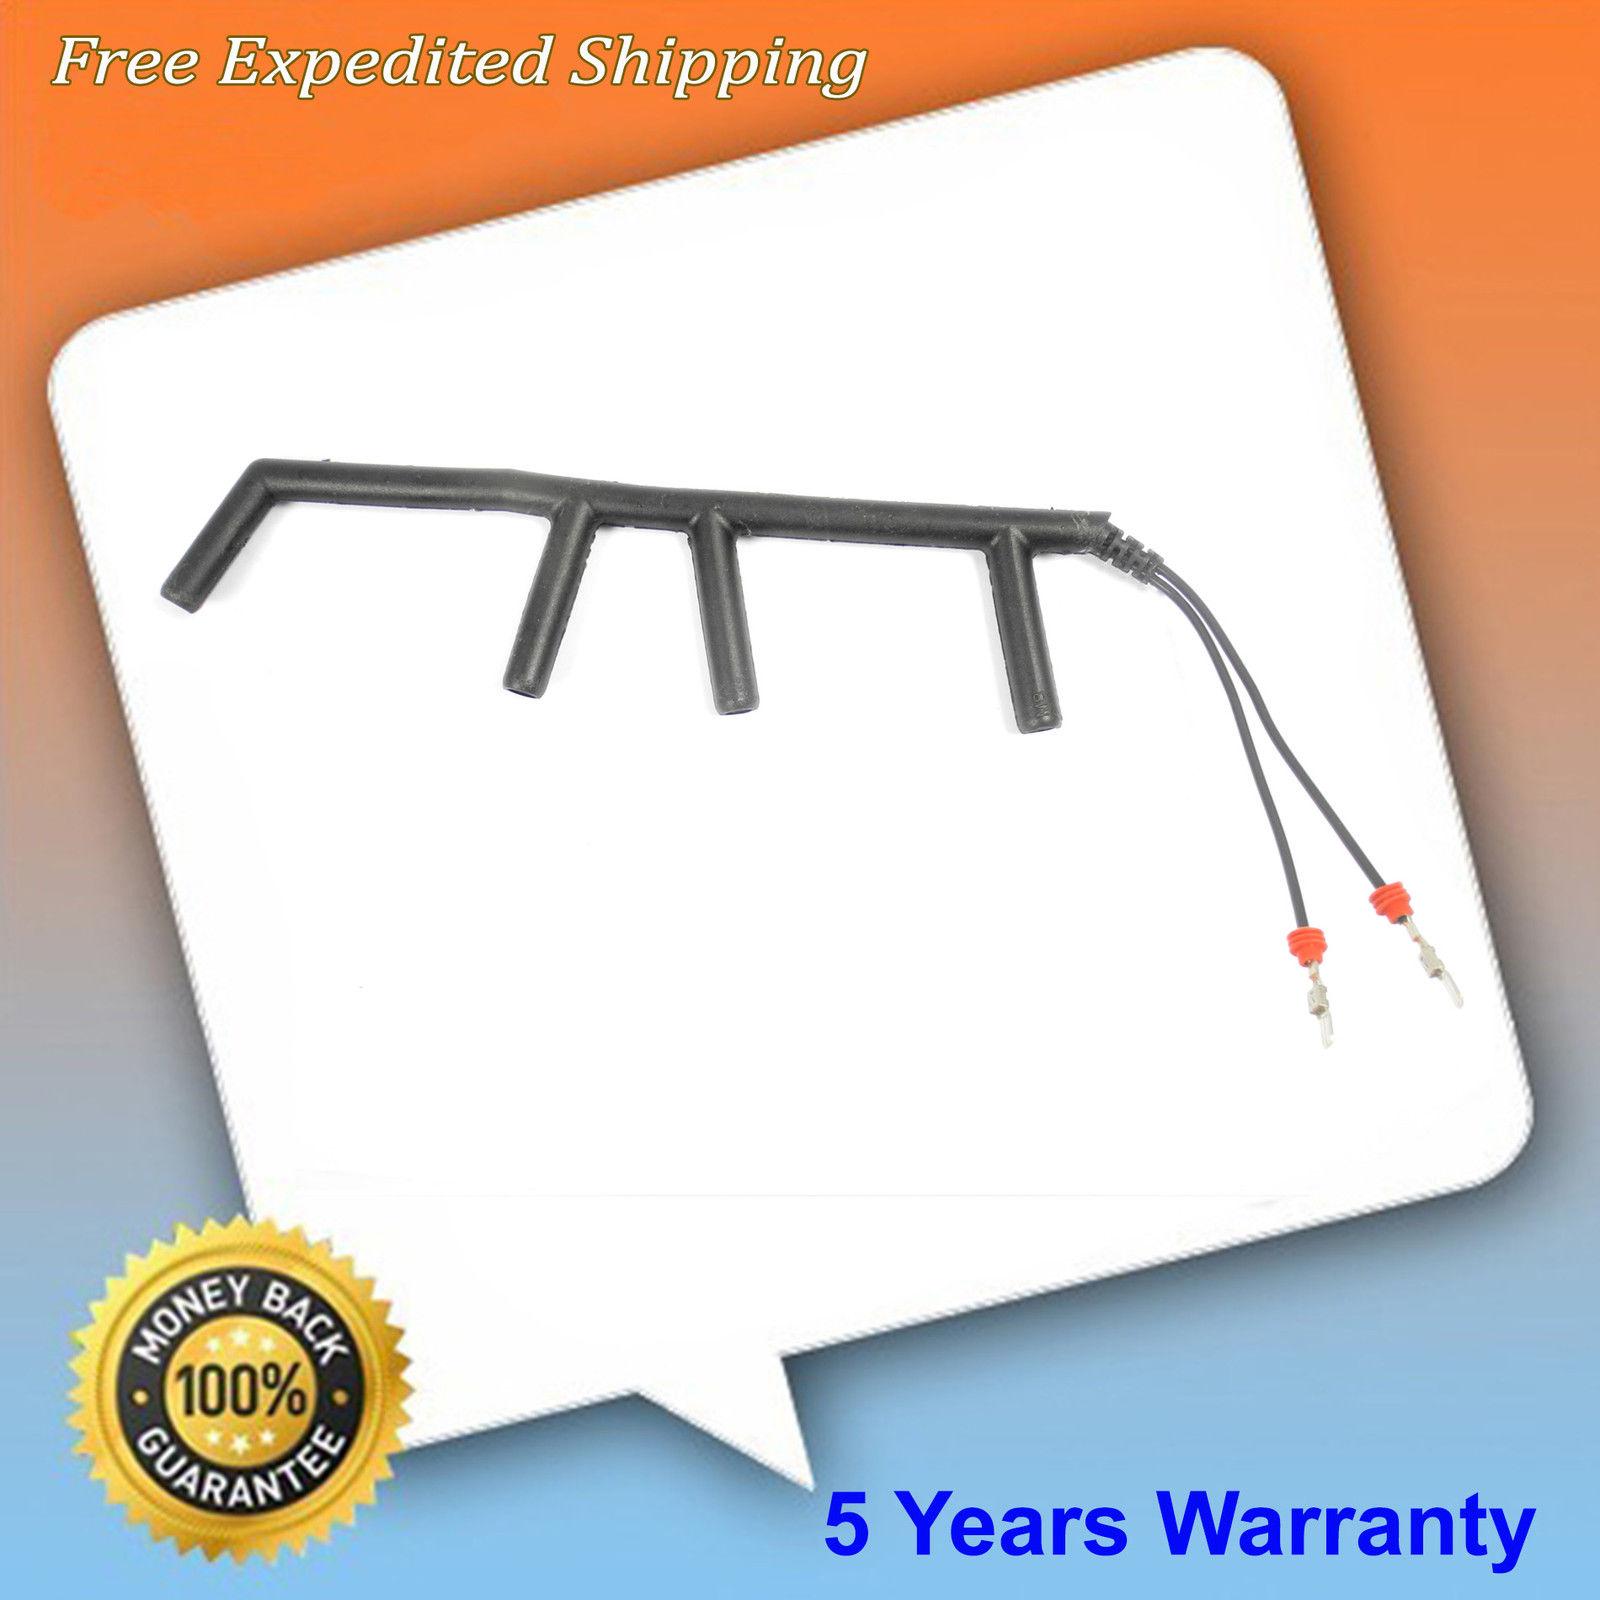 For Vw Beetle Golf Jetta Passat 19 2 Wire Glow Plug Wiring Harness Bug Installation 028971766